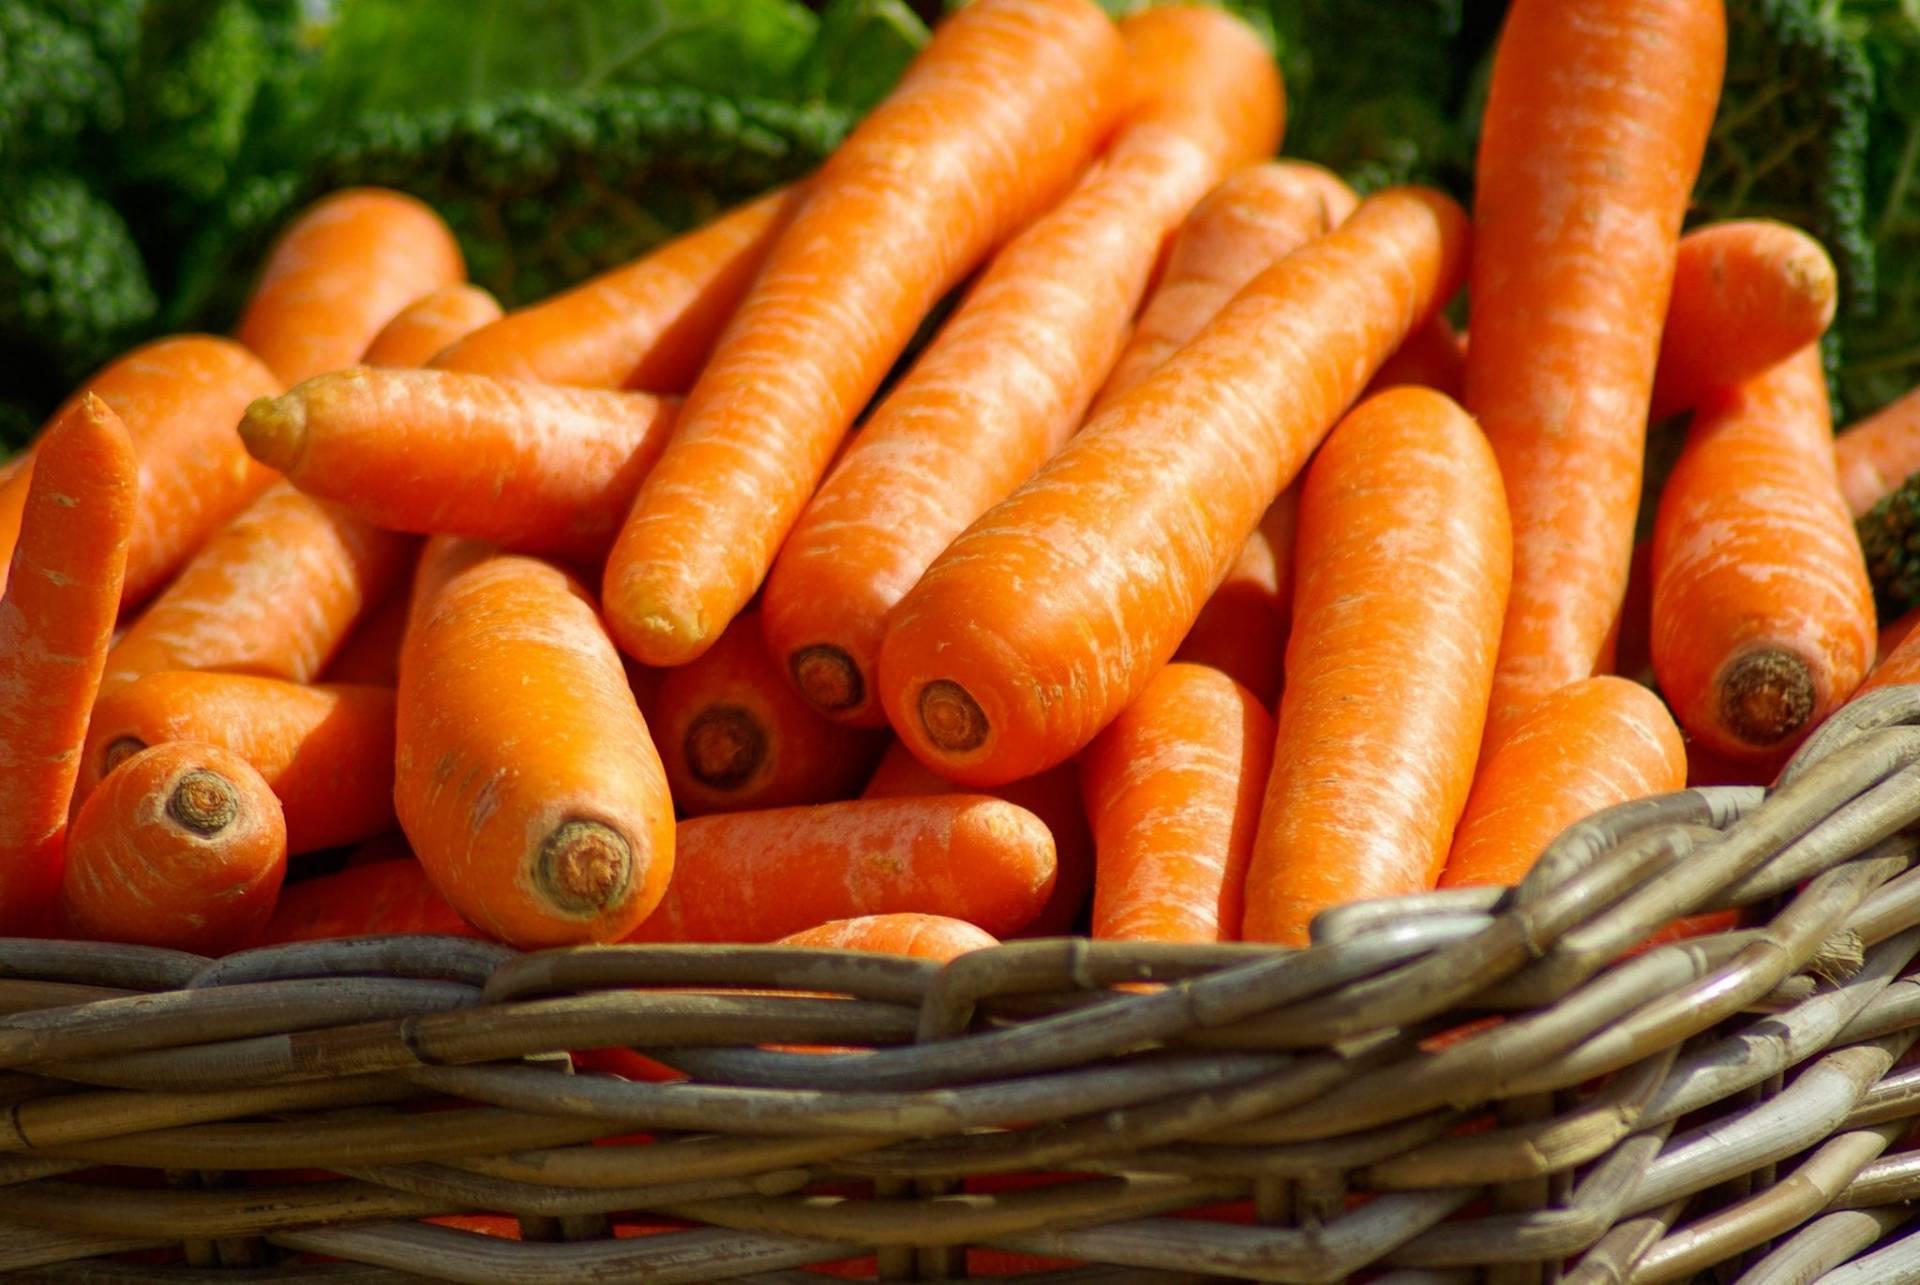 Carrots make healthy office snacks